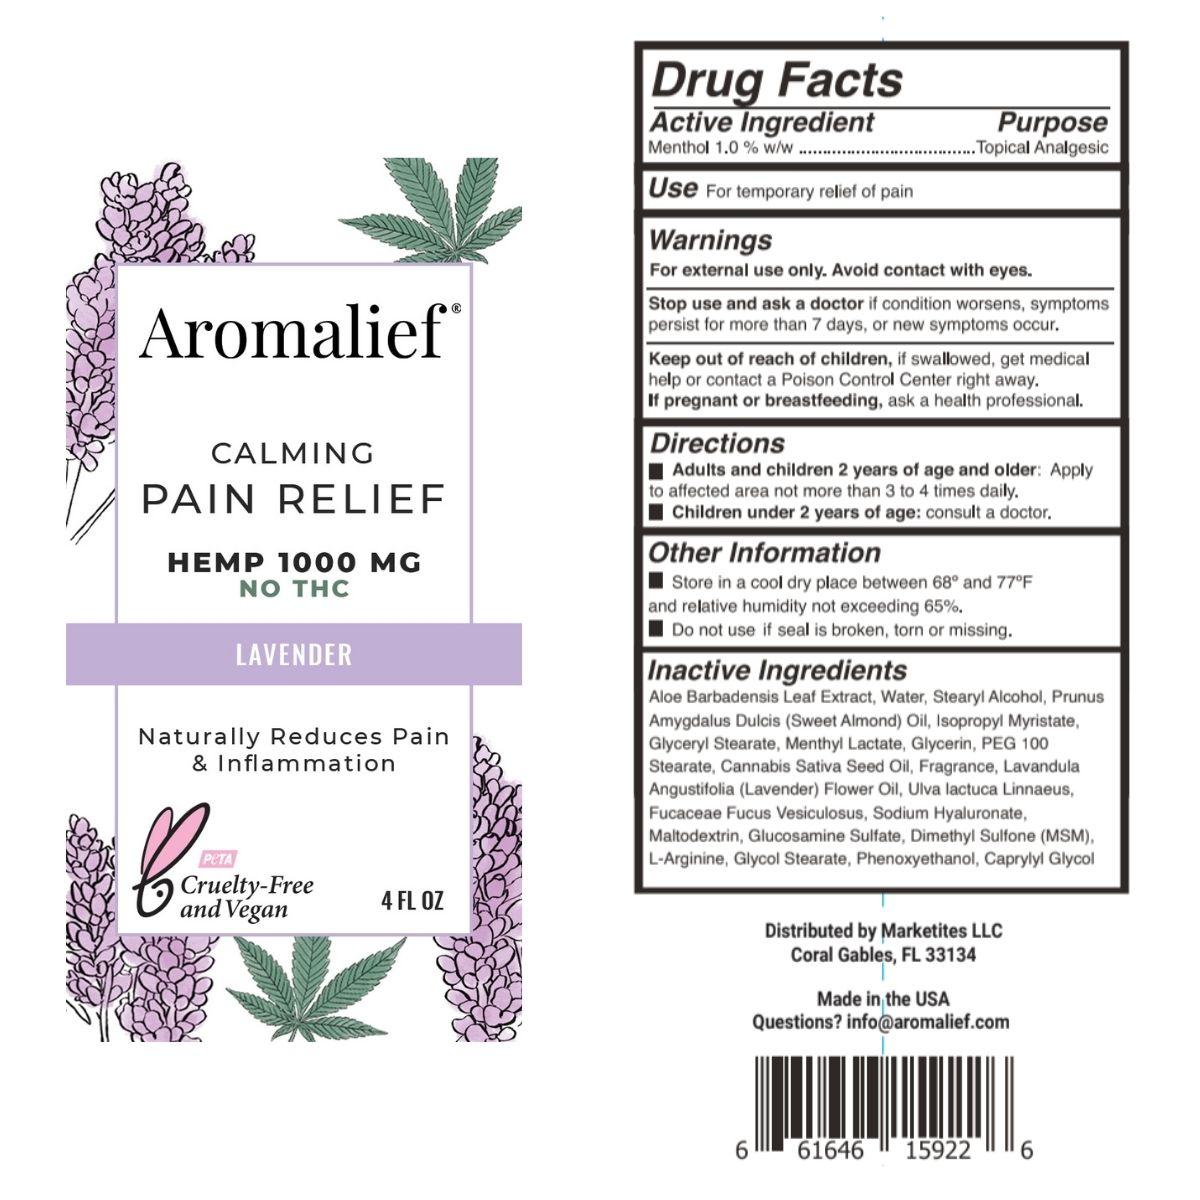 Aromalief Calming Pain Relief